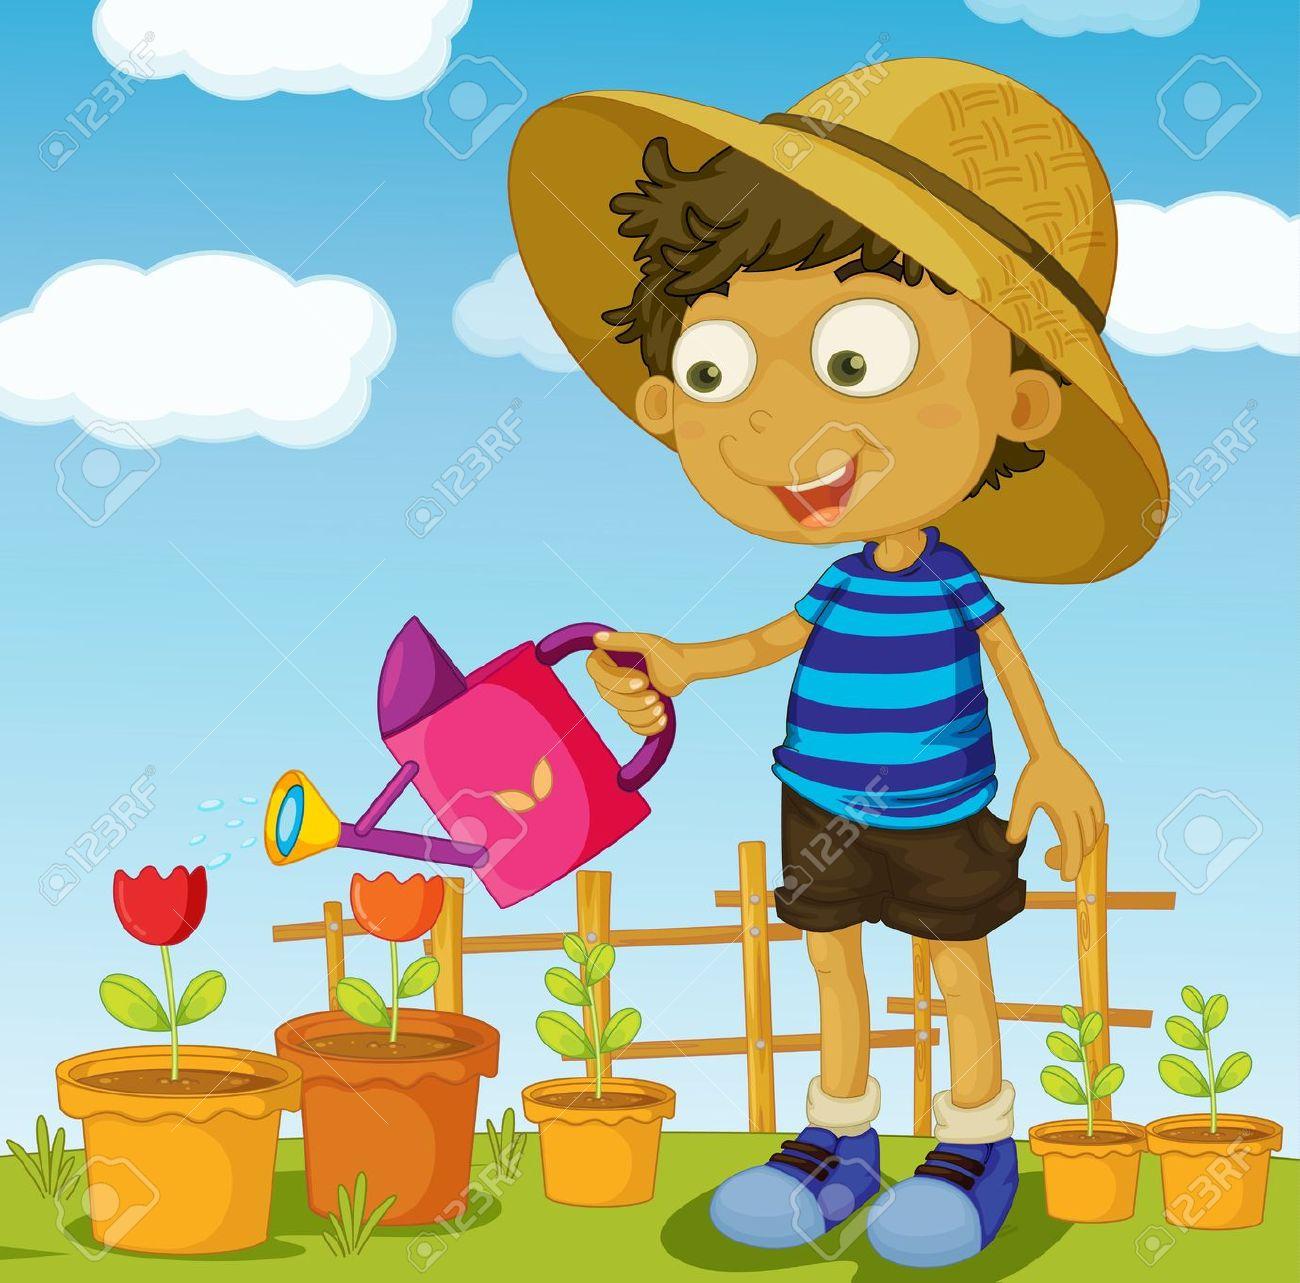 Watering Can clipart kid plant Watering kids kids plants watering